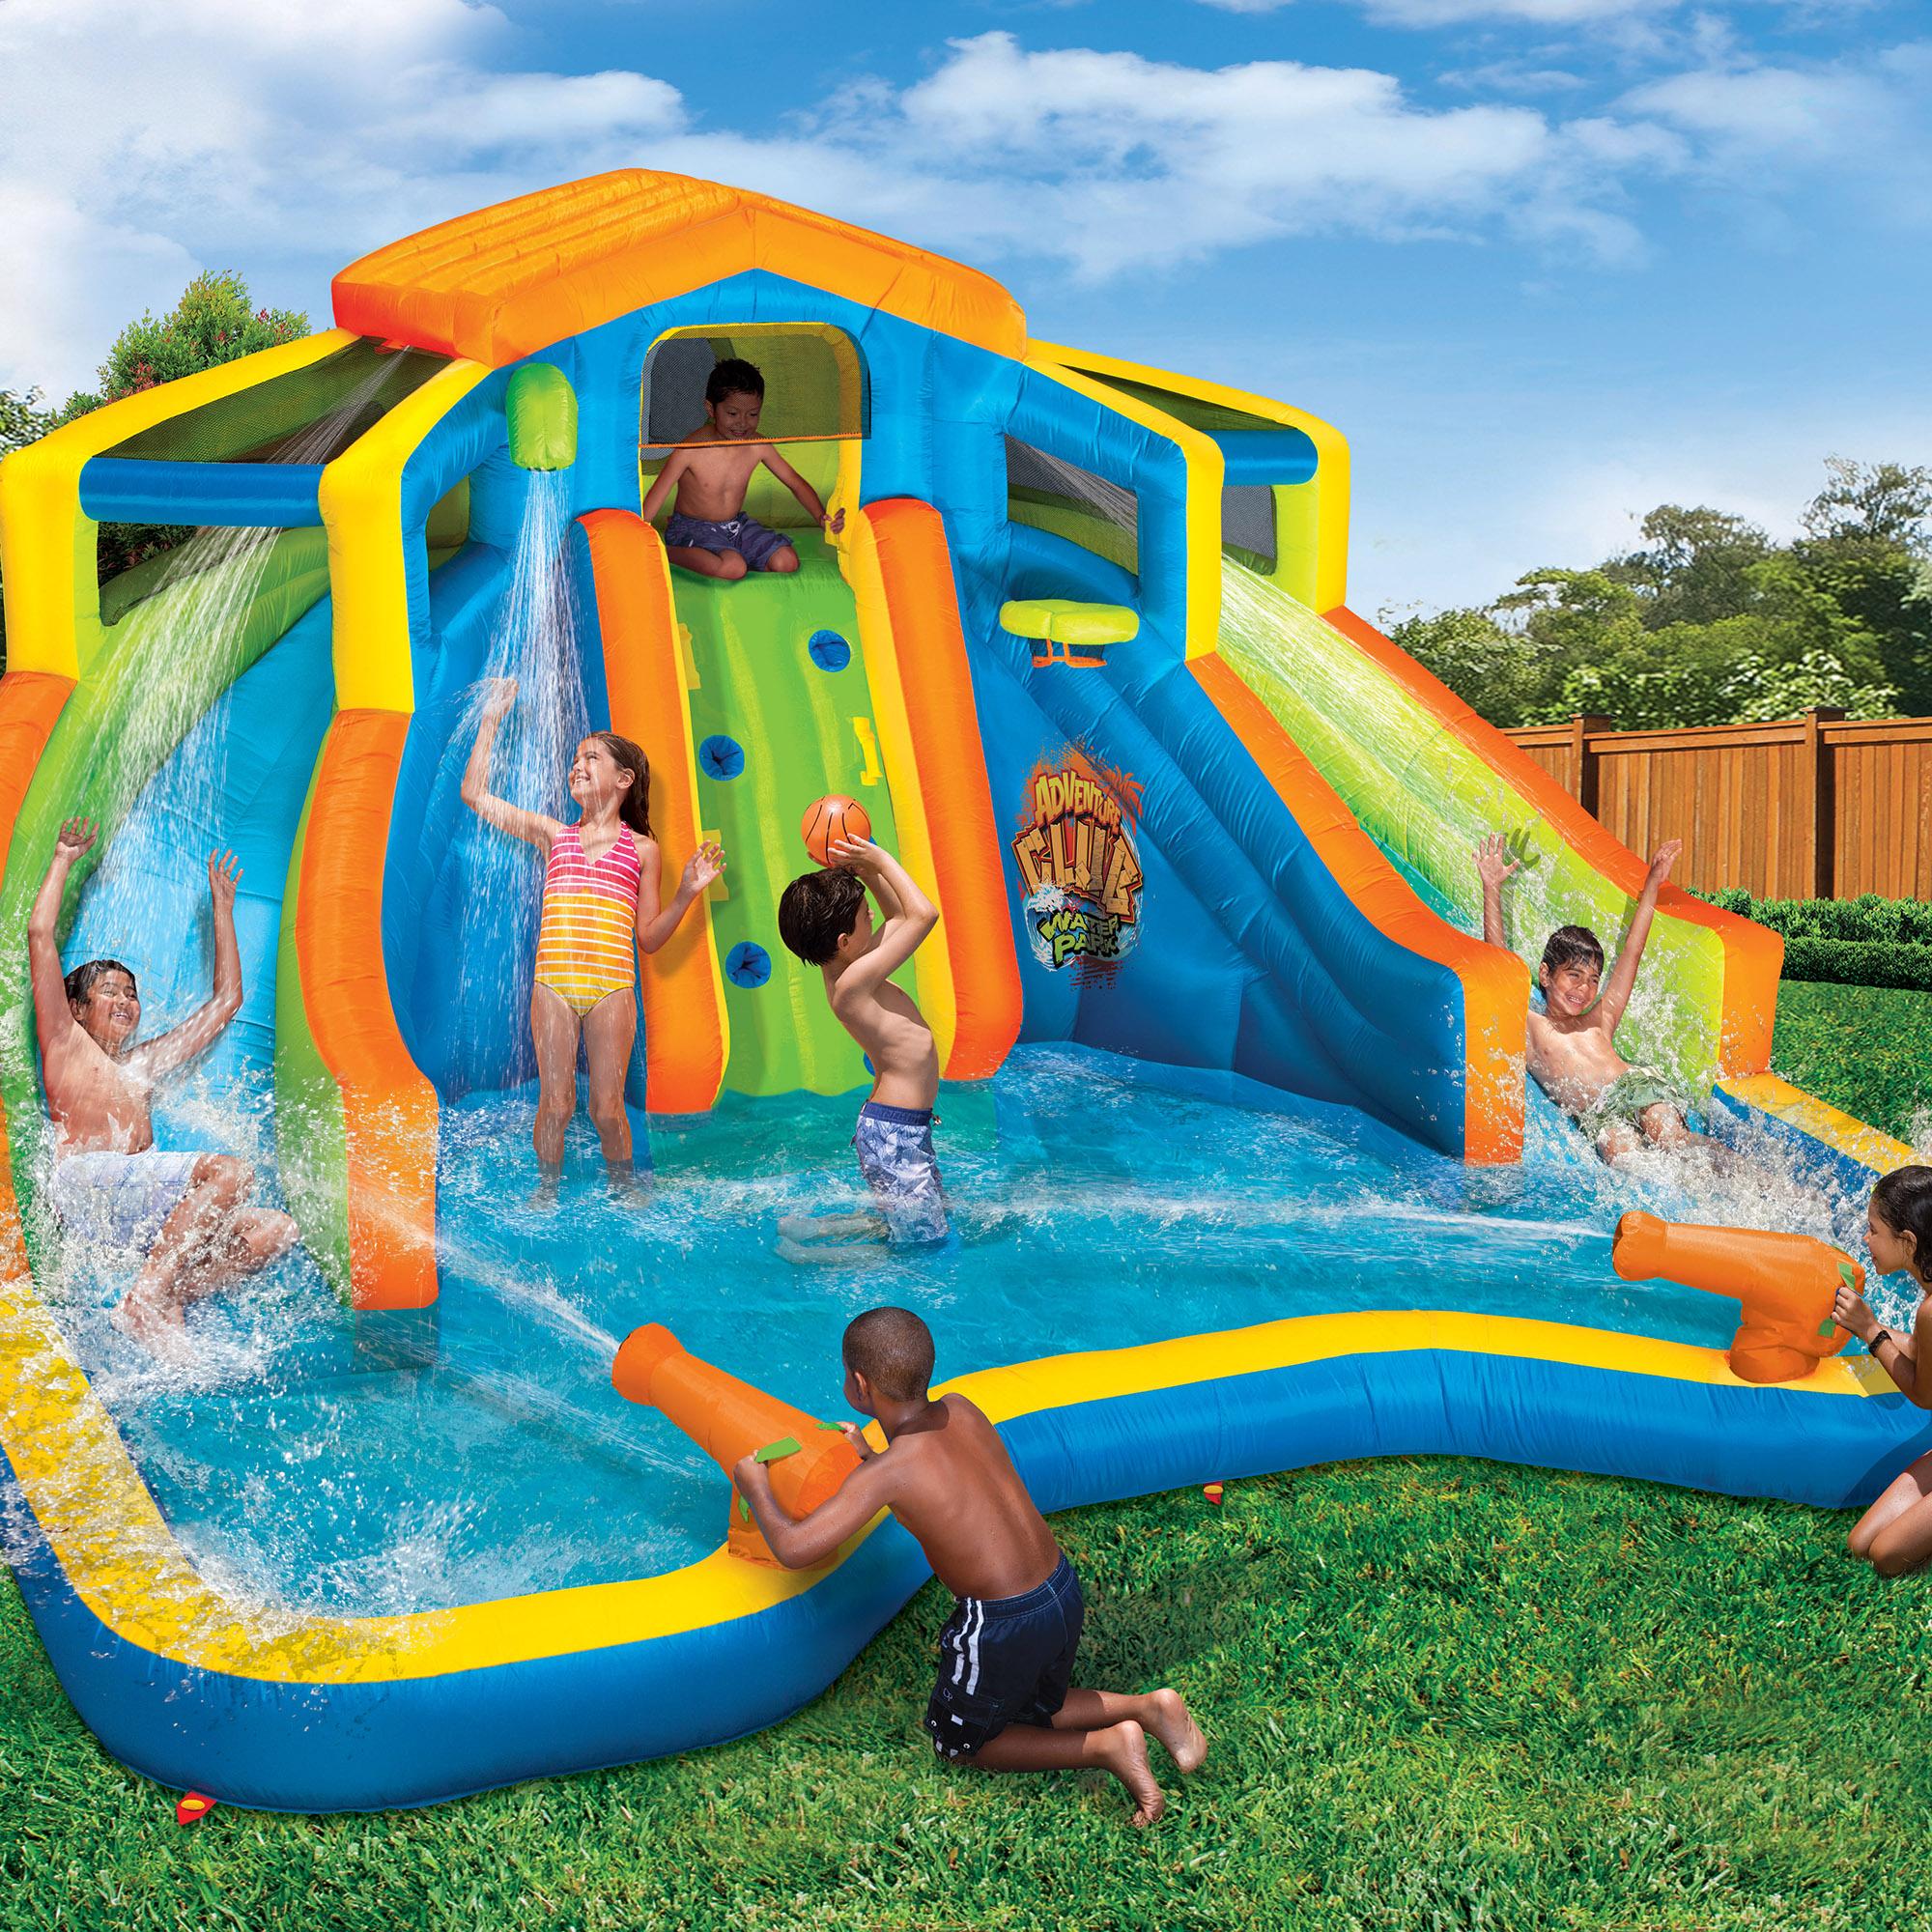 Banzai Inflatable Adventure Club Dual Slide And Pool